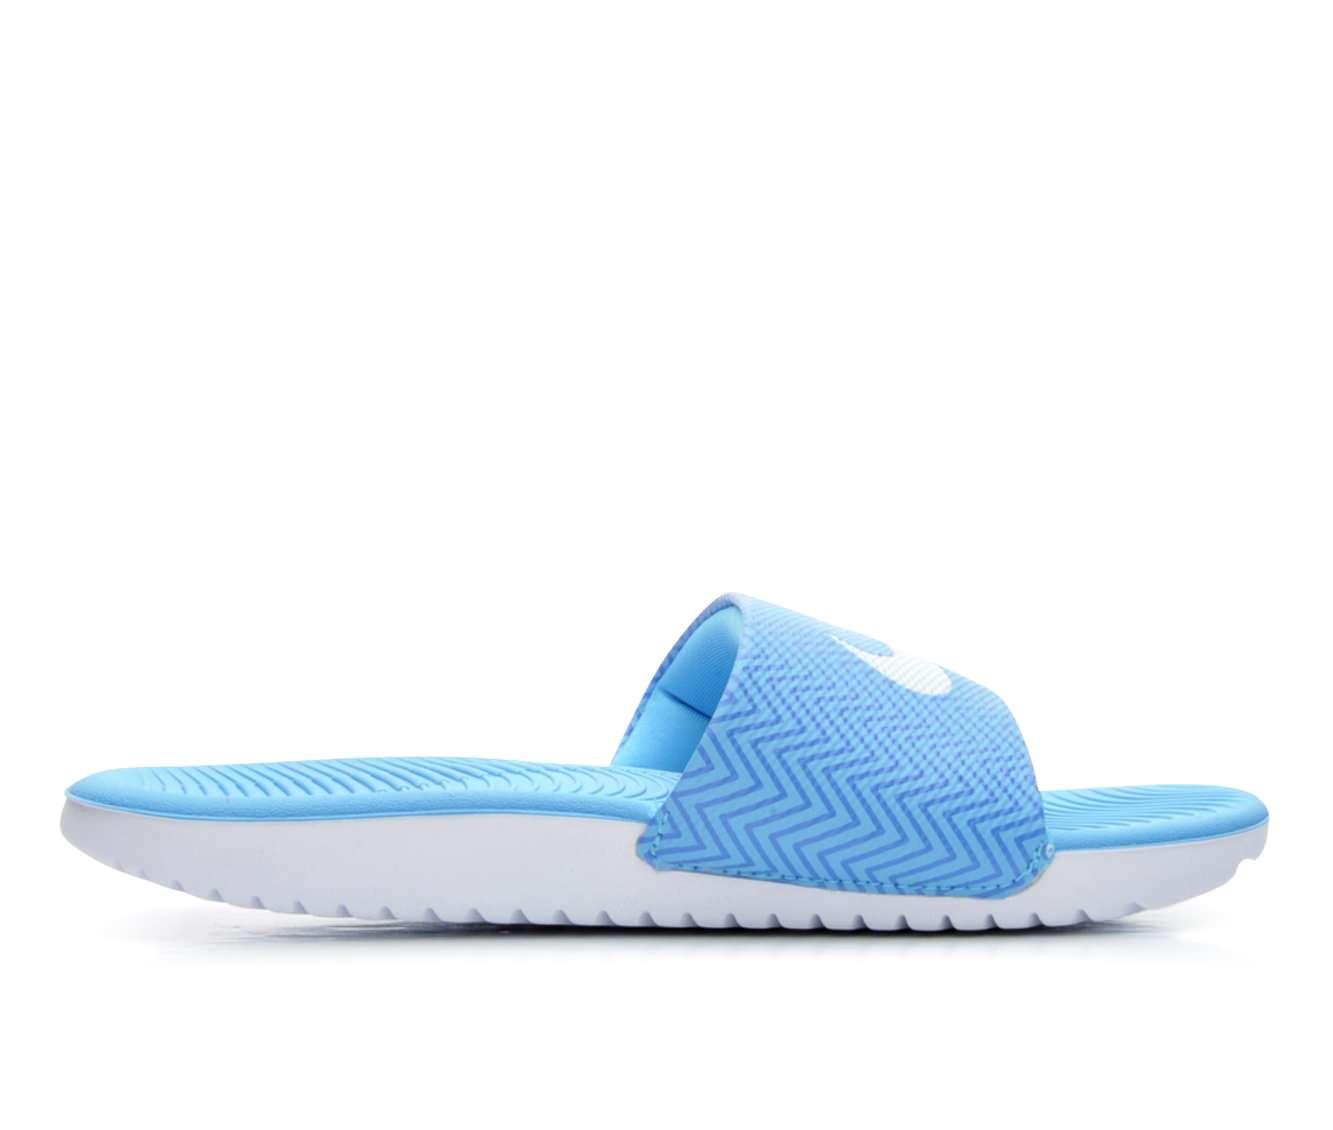 Women's Nike Kawa Slide Print Sandals (Blue)